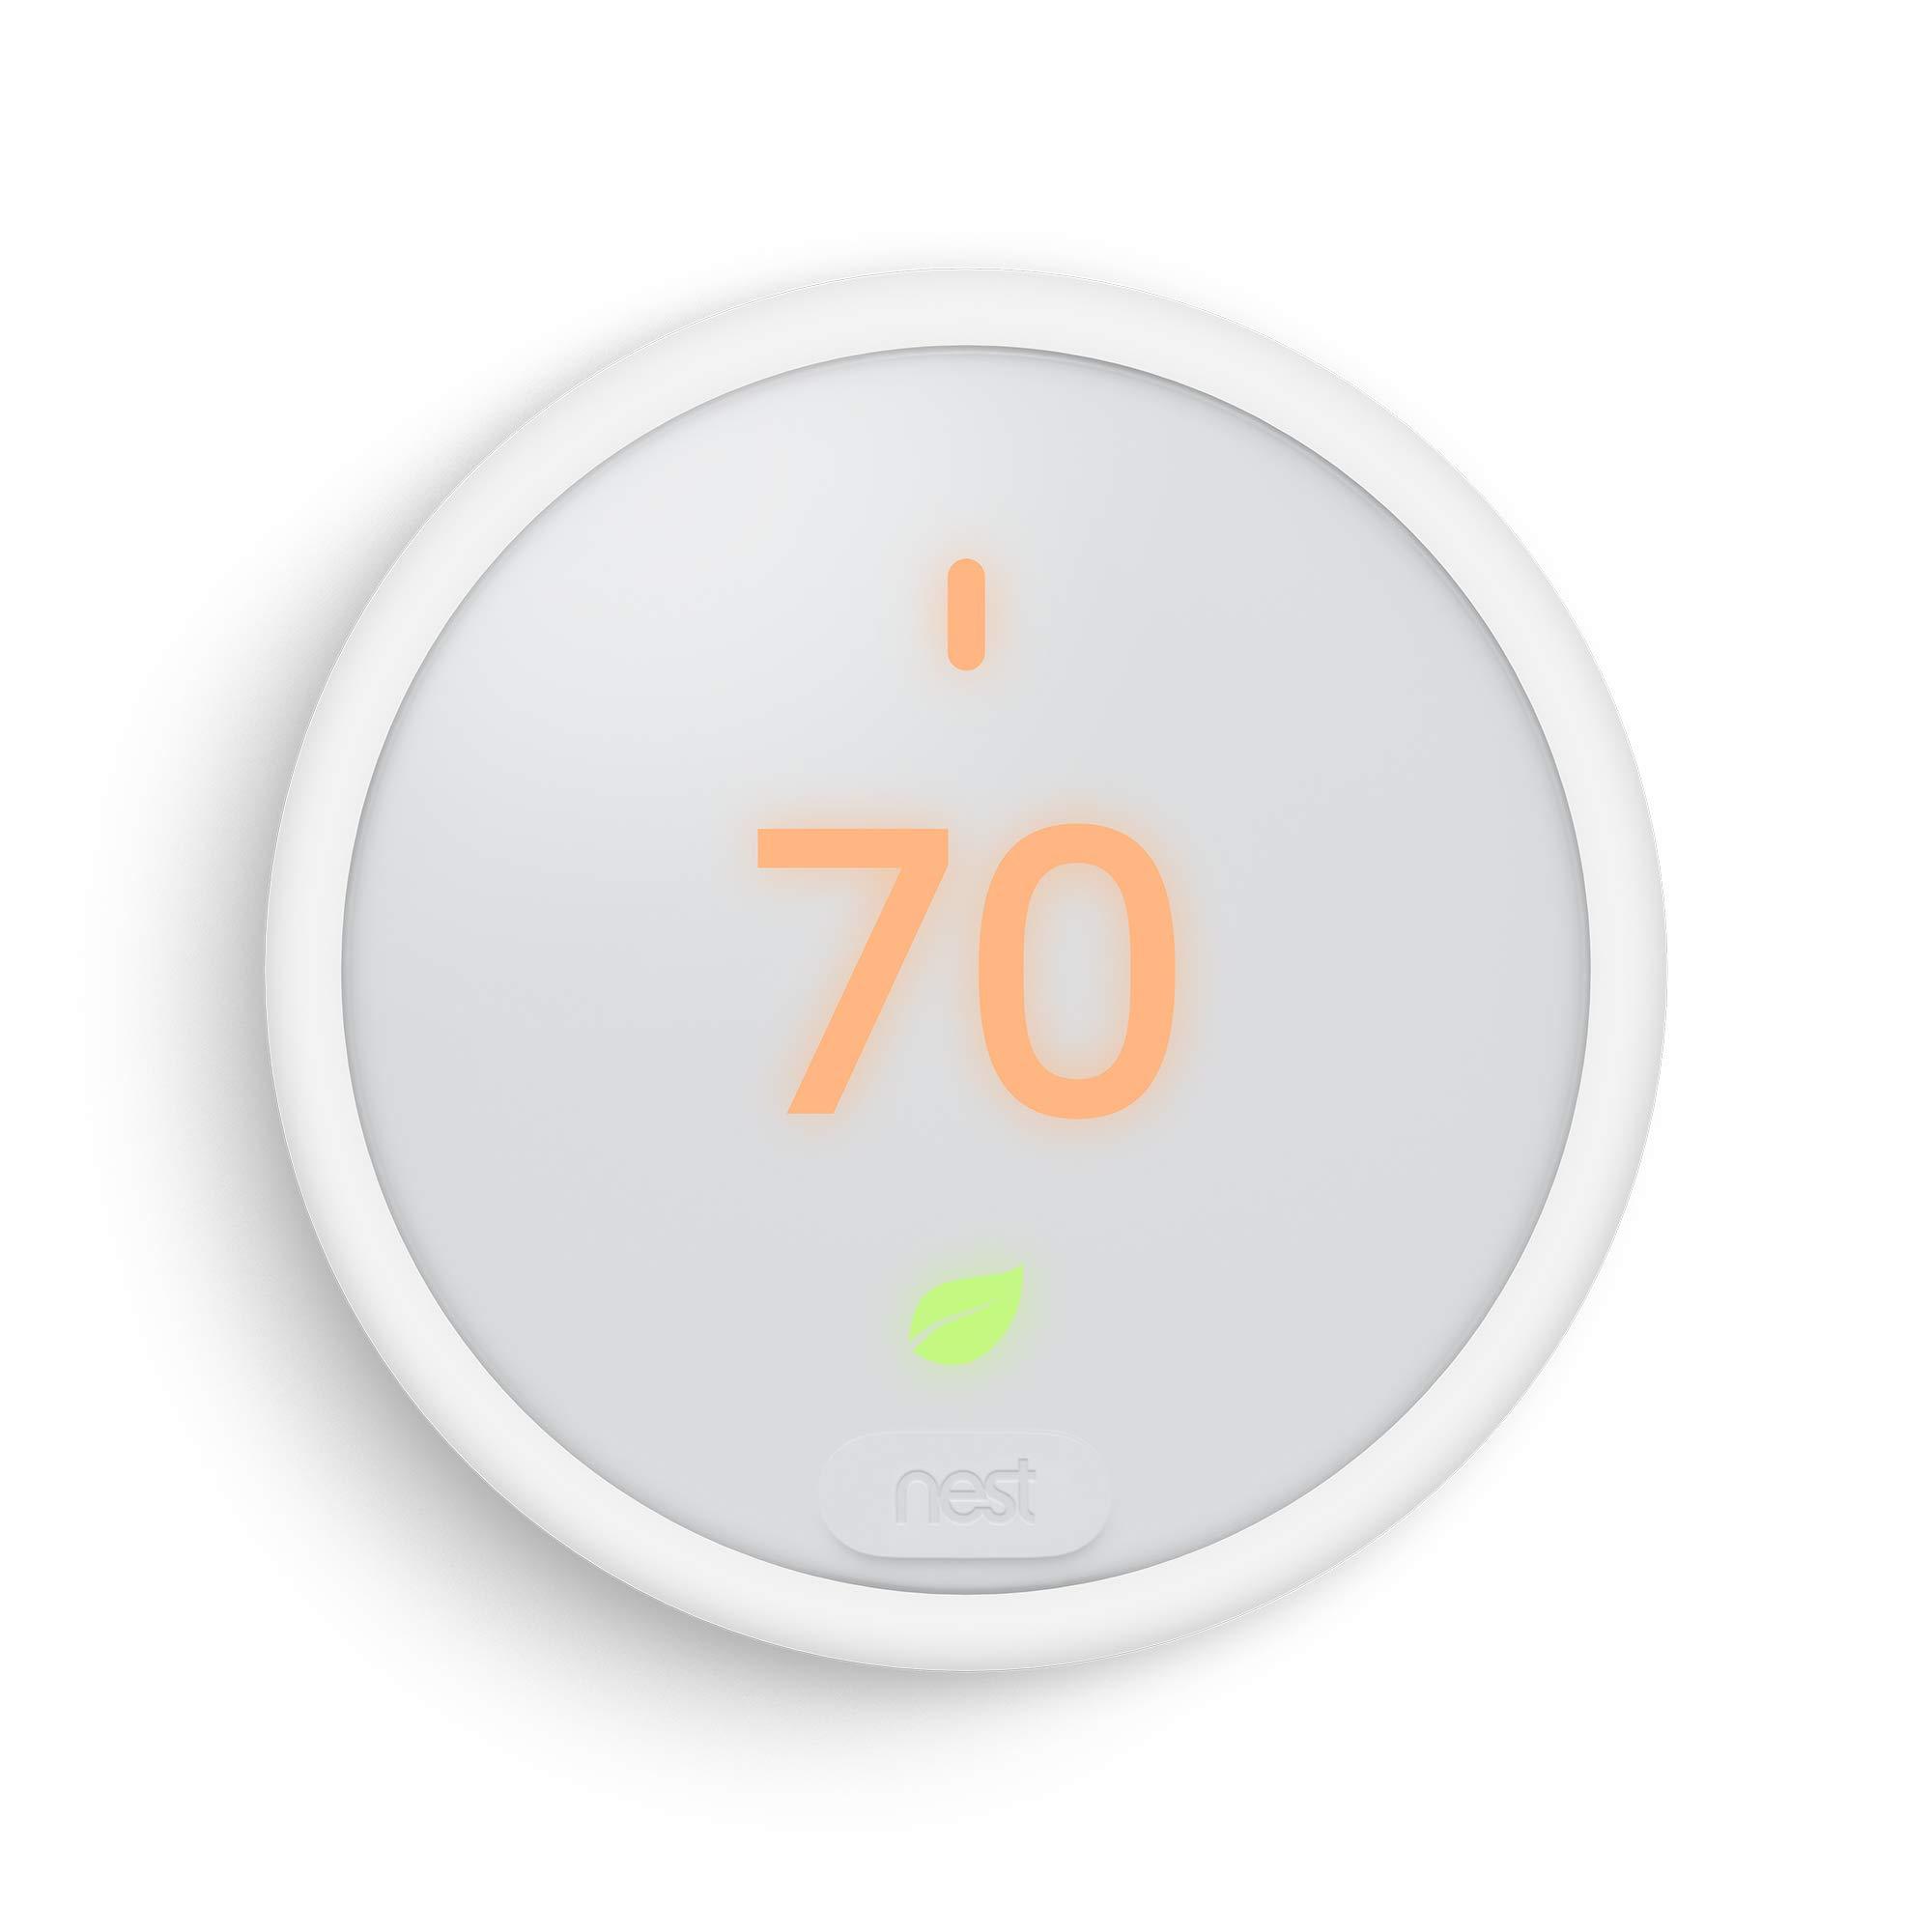 Nest T4000ES Thermostat Works Alexa